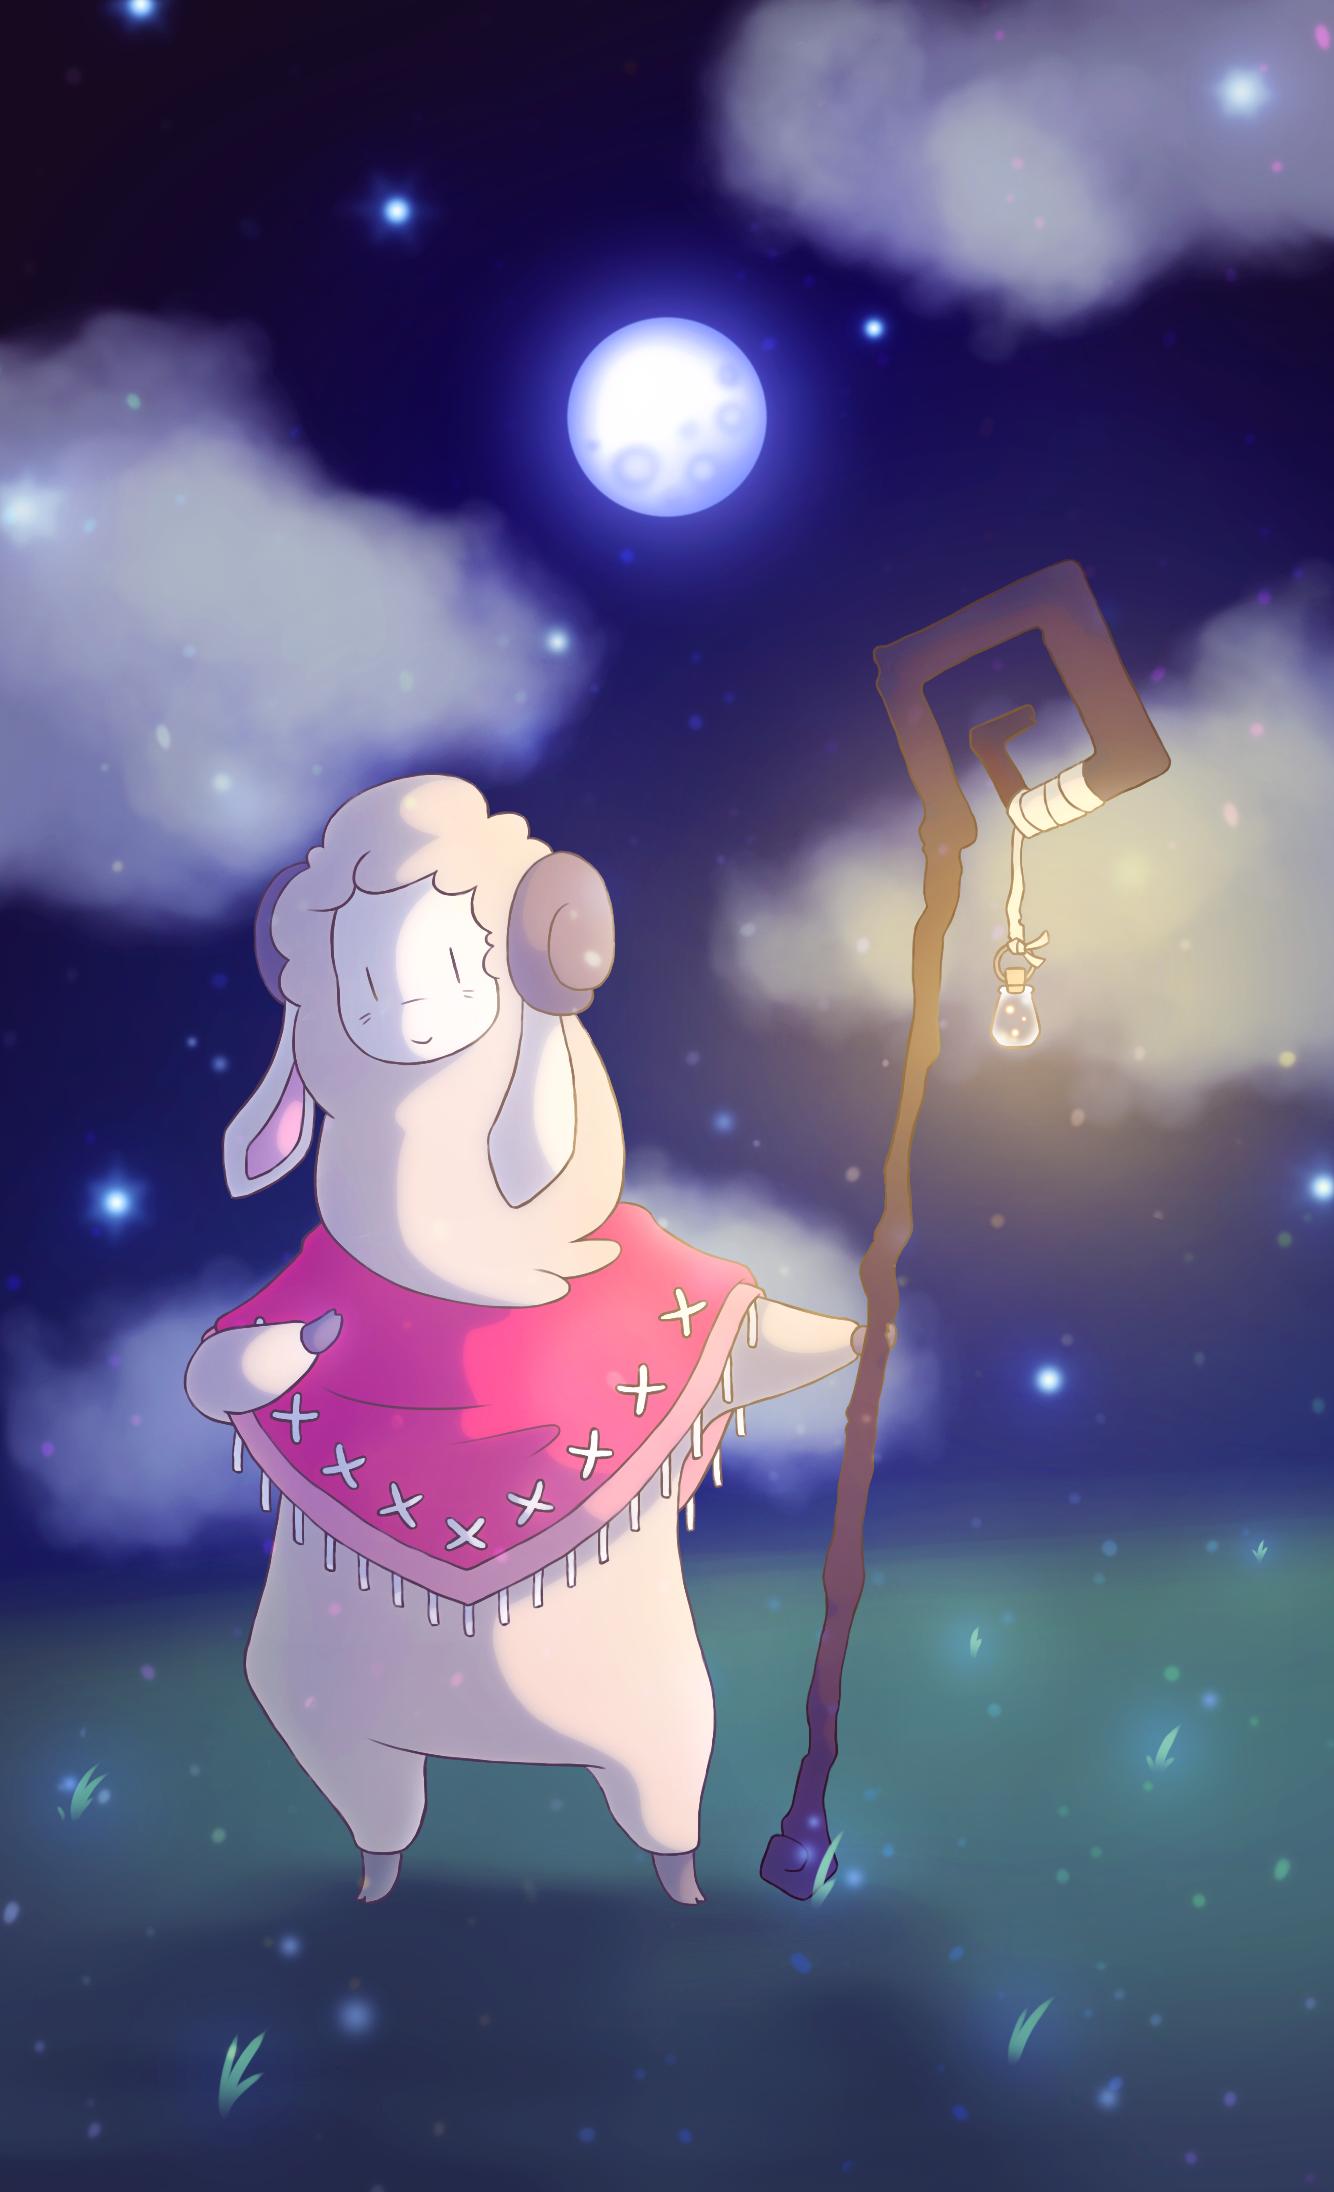 Sheepard